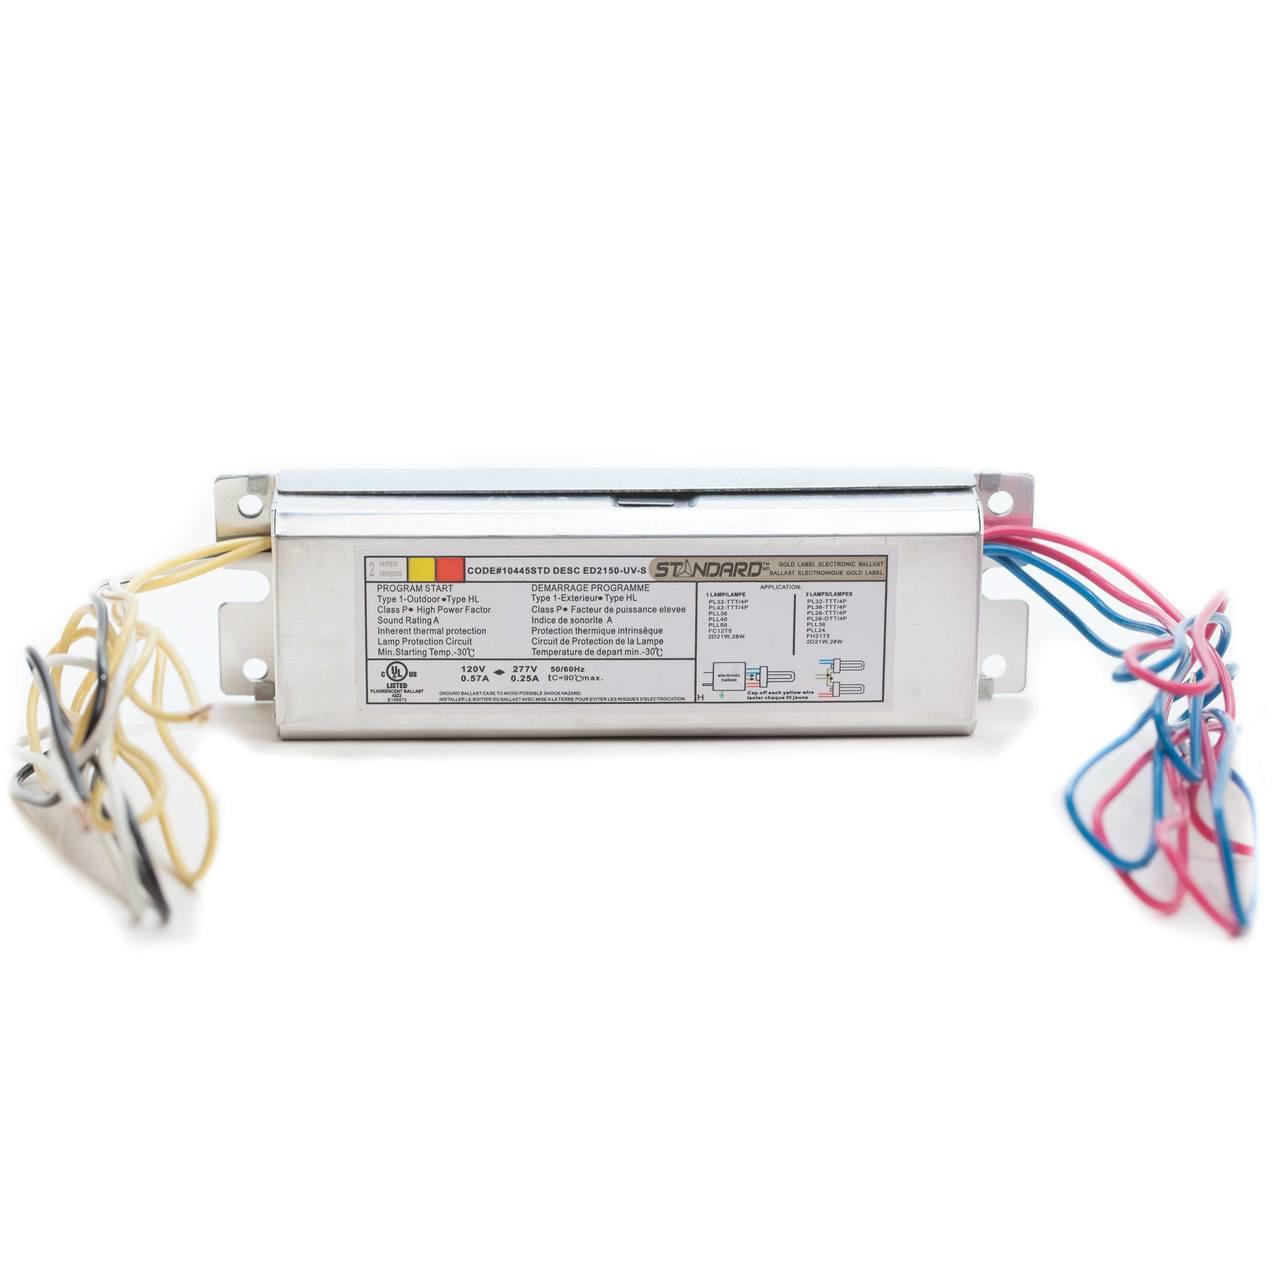 standard 120v pl series programmed start electronic ballast 1 2 lamp [ 1280 x 1280 Pixel ]